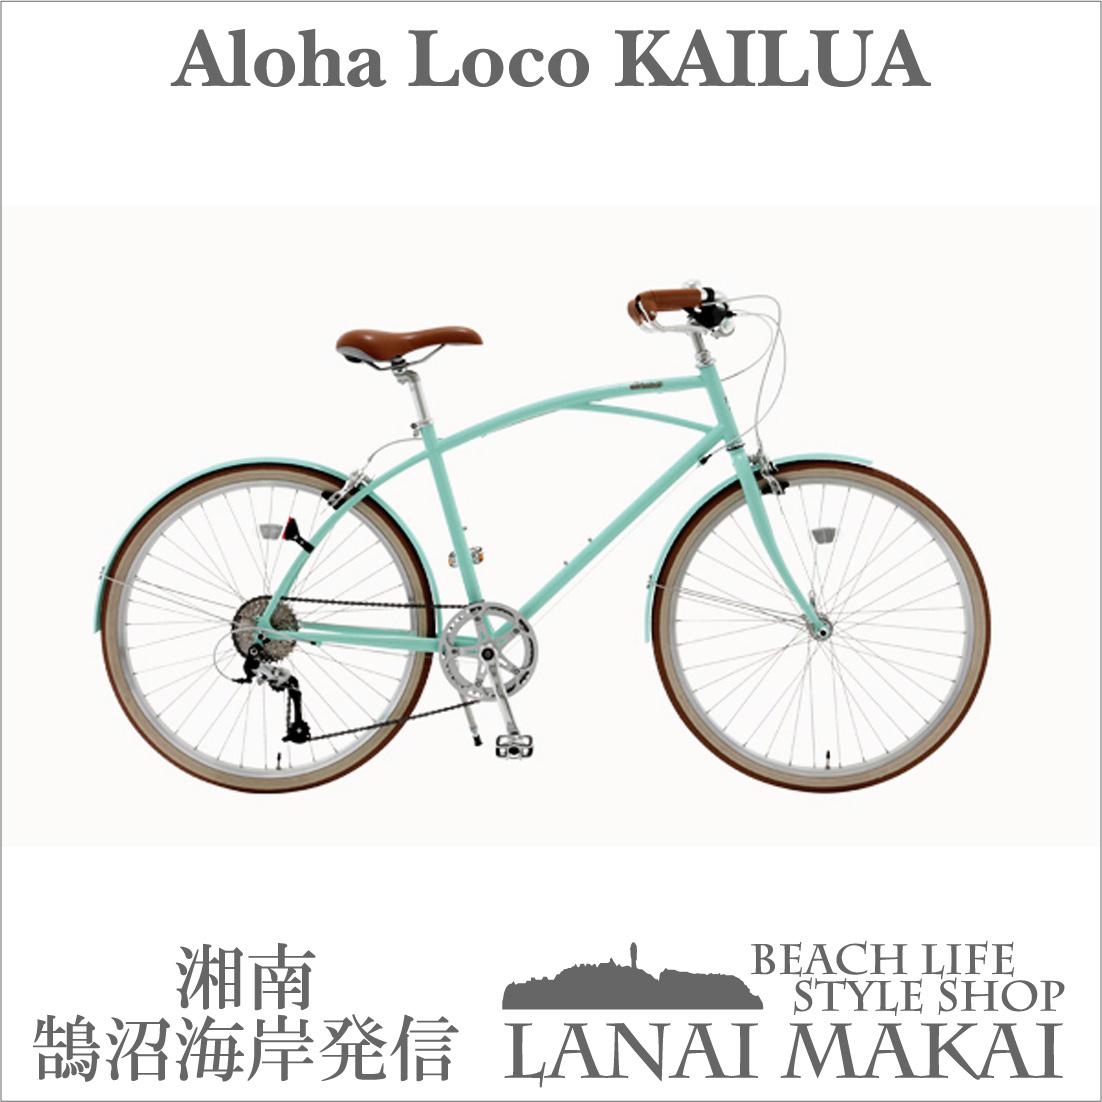 "【Aloha Loco Kailua】アロハロコ カイルア""26インチカジュアルバイク8段変速""COL:パステルグリーン湘南鵠沼海岸発信ビーチクルーザー クロスバイク"